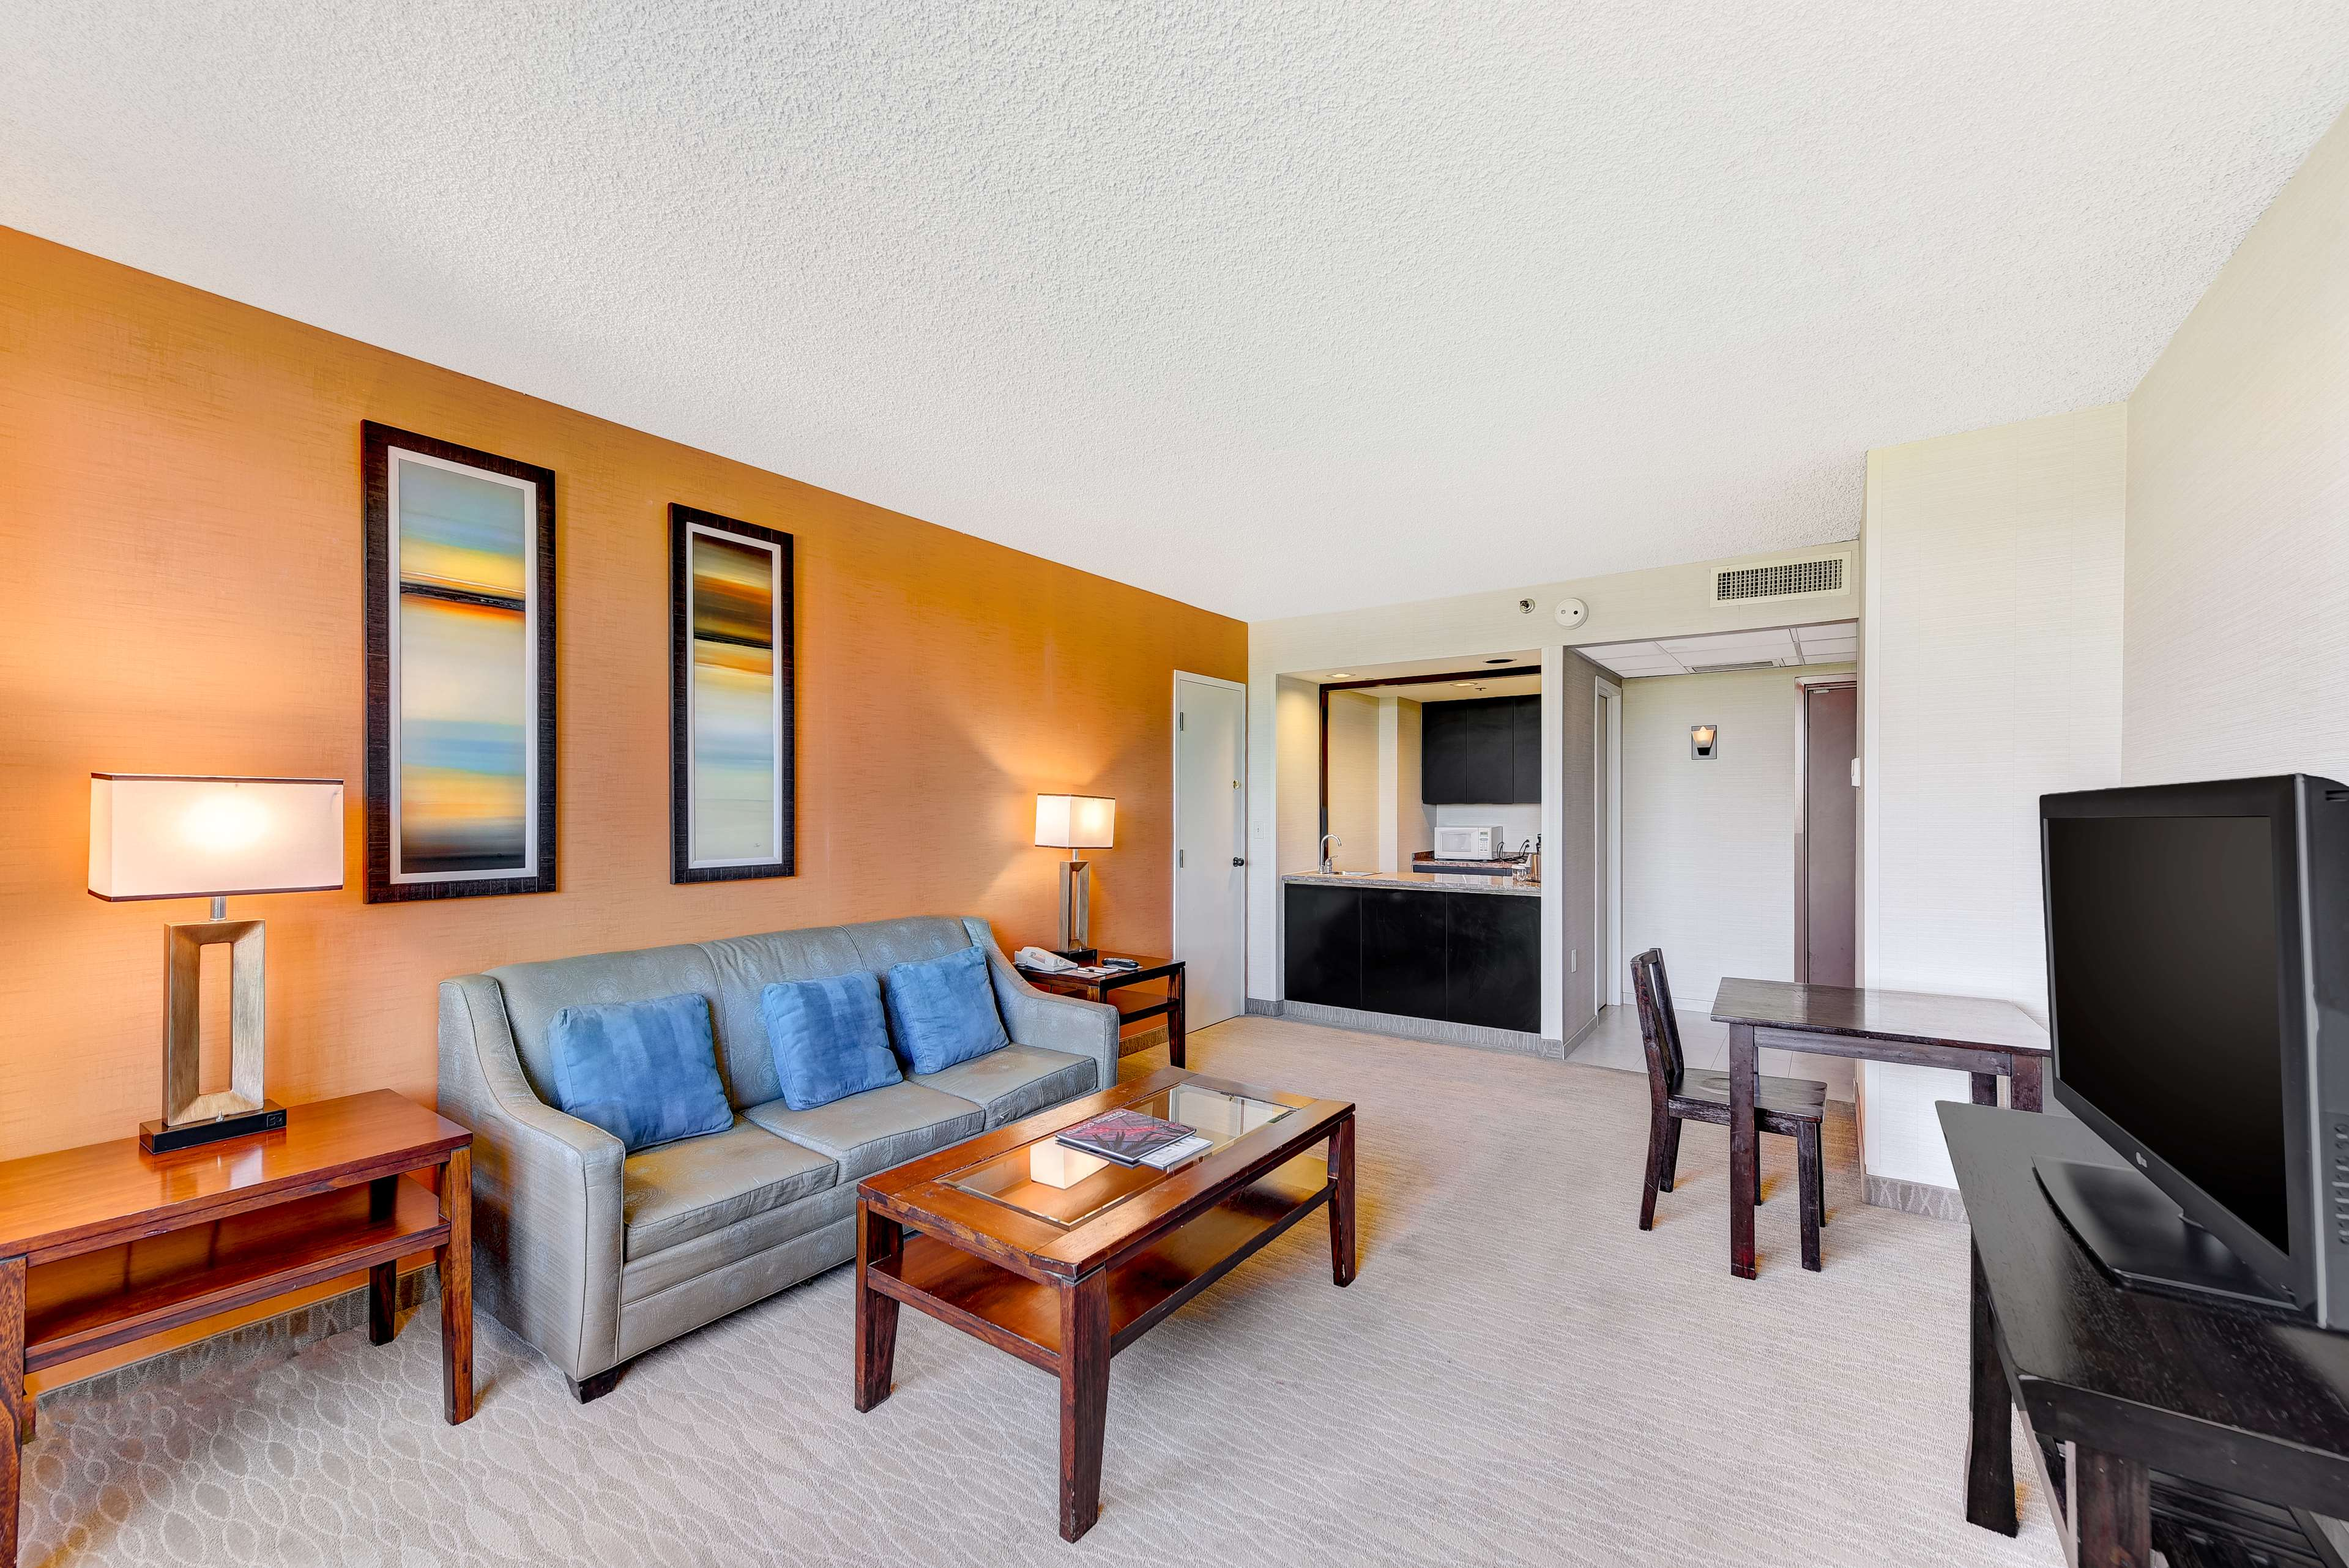 DoubleTree by Hilton Hotel Anaheim - Orange County image 44